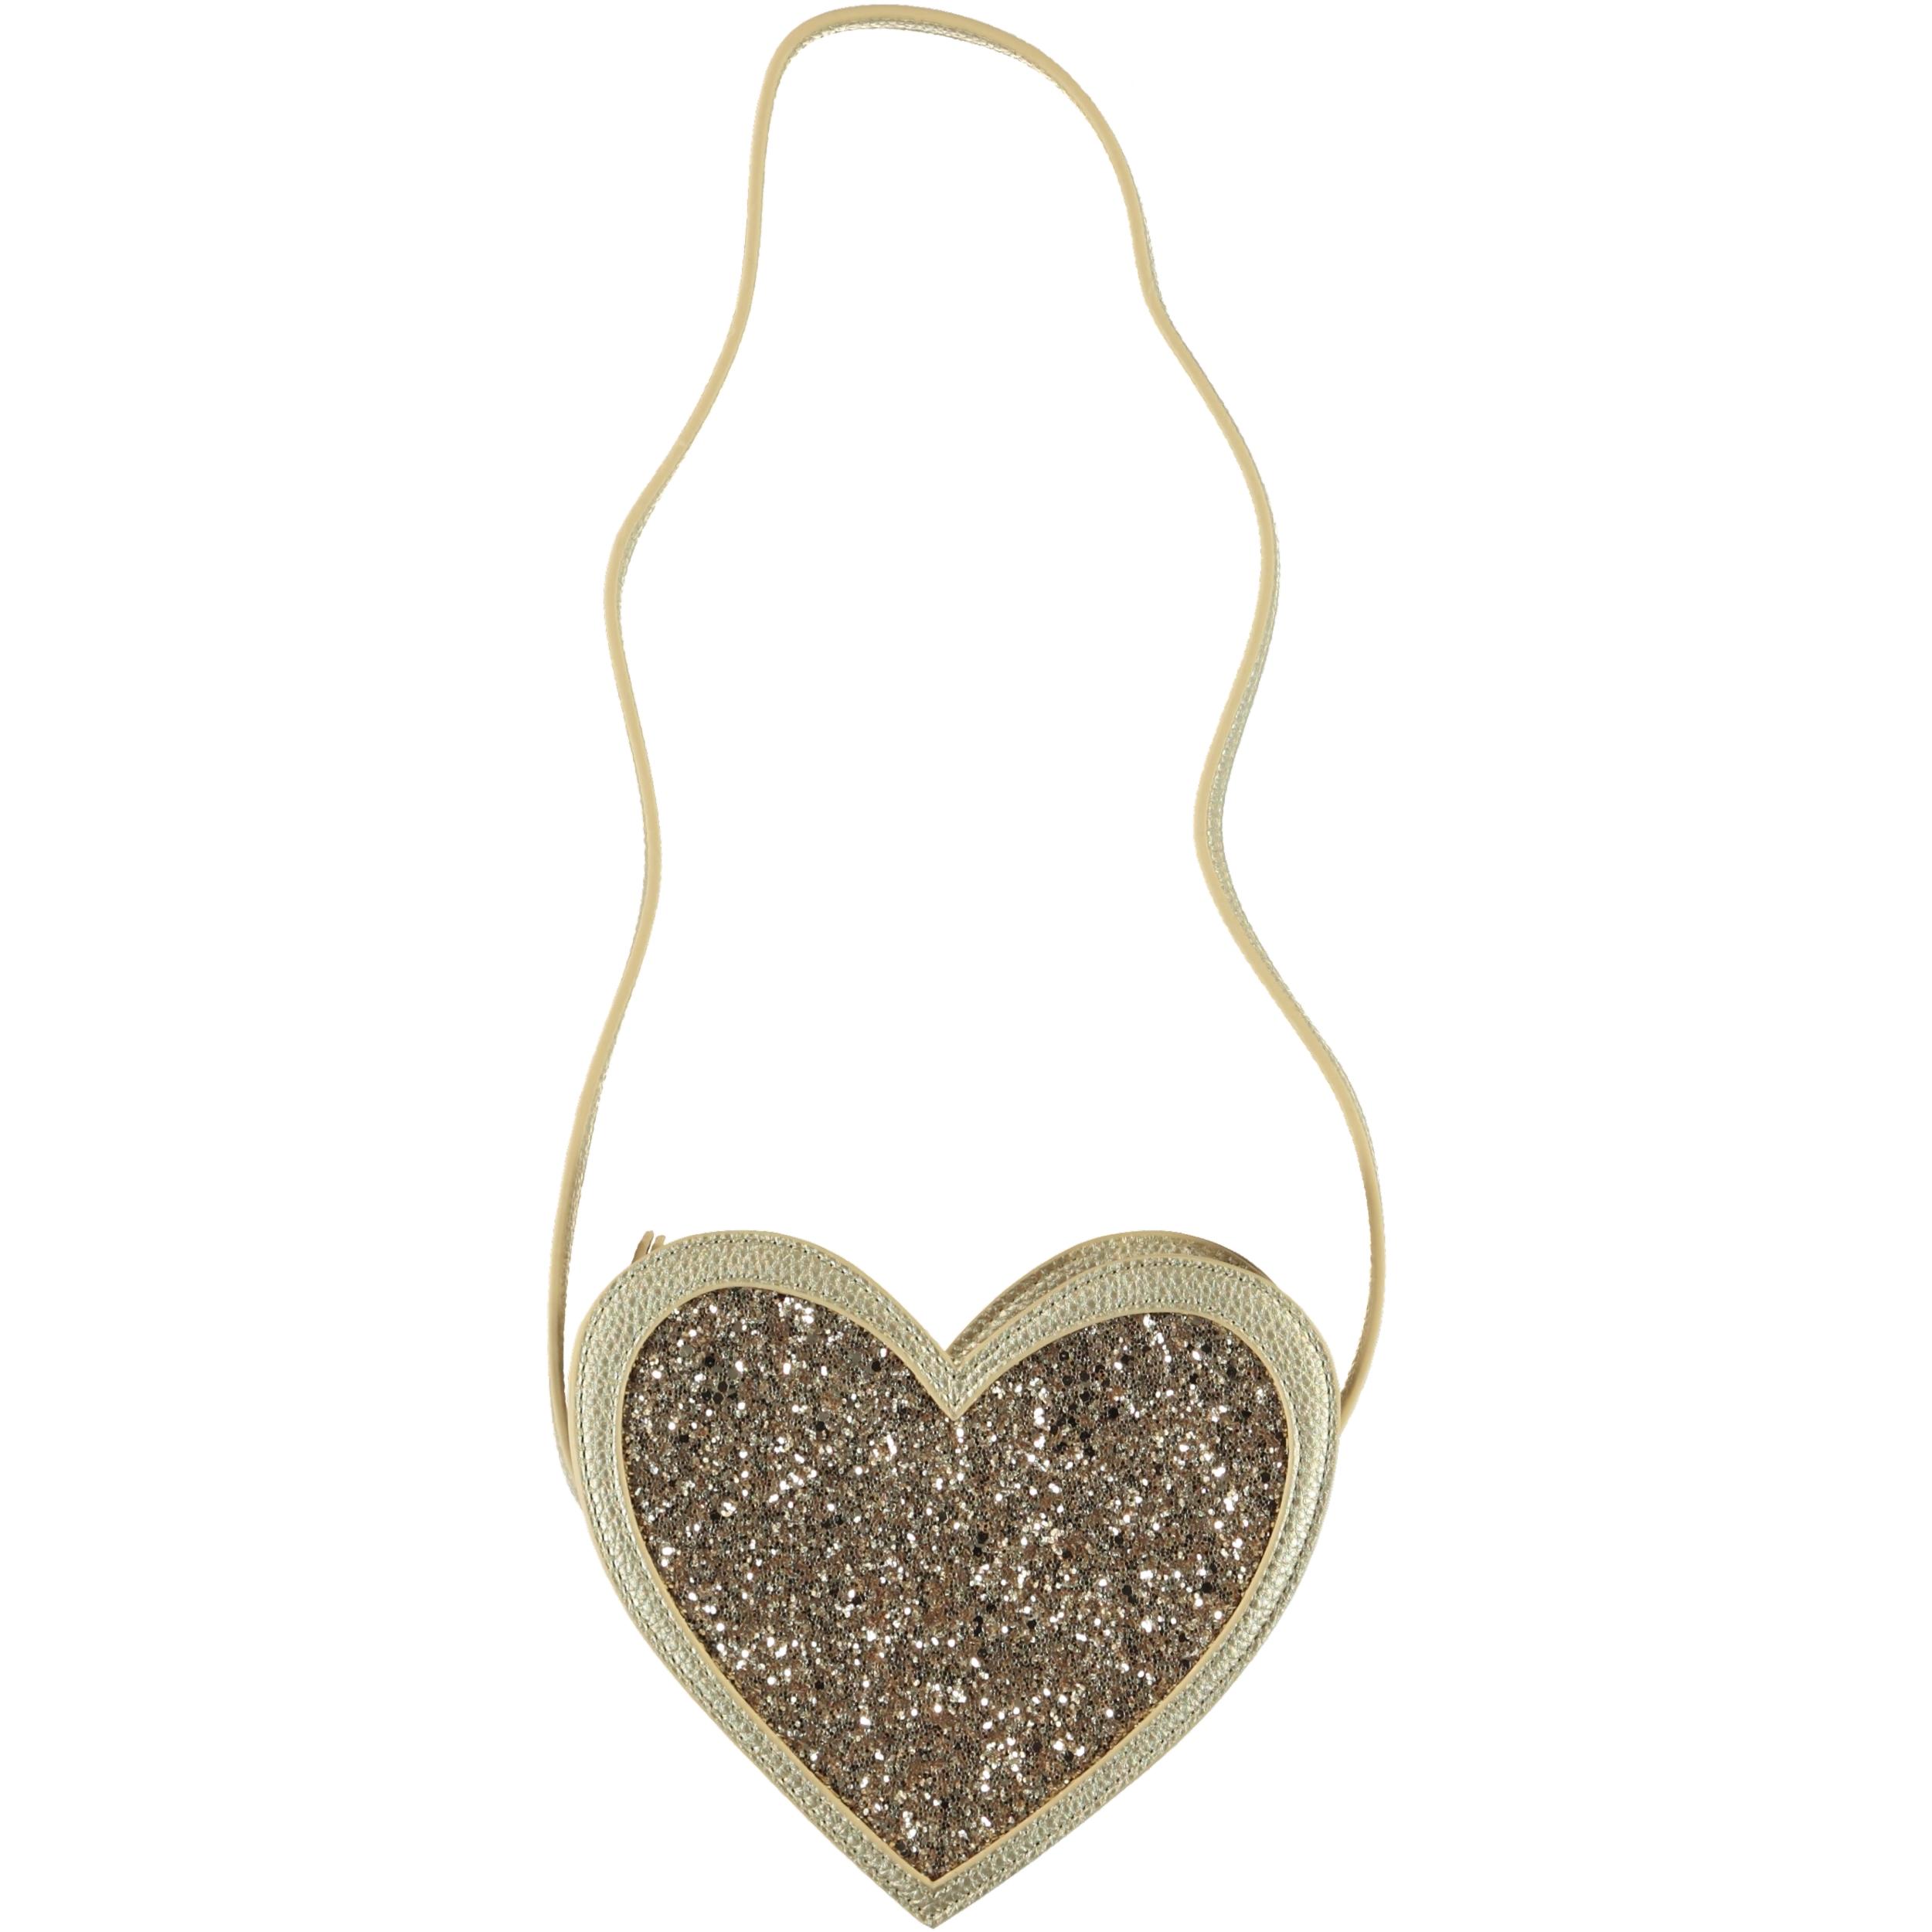 Heart Bag Gold Glitter